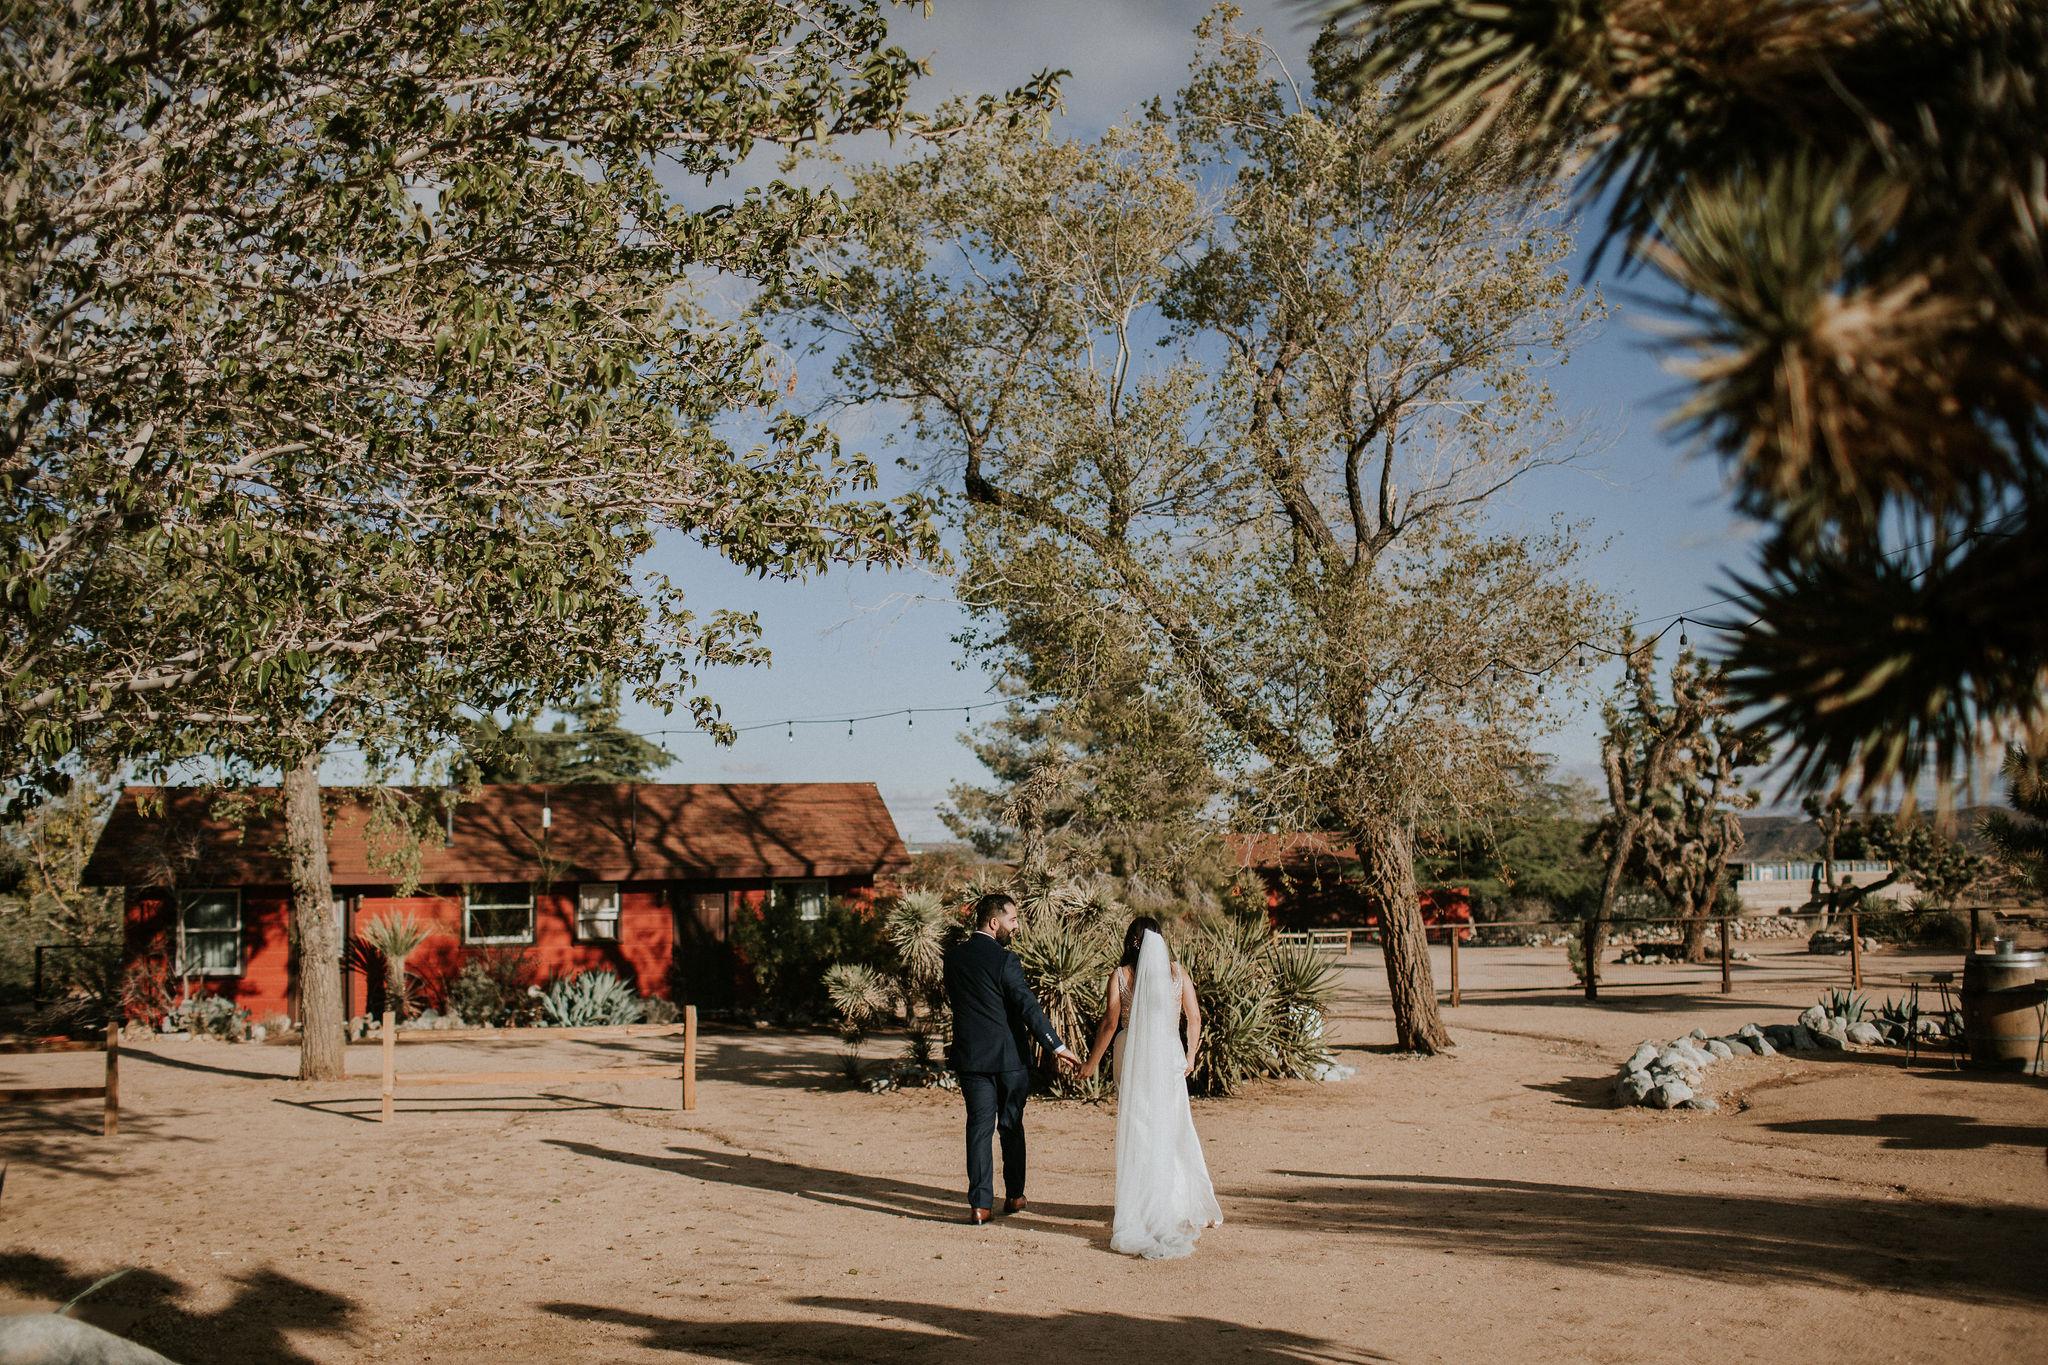 RimrockRanch-JoshuaTree-Wedding-Jami-Laree-403.jpg